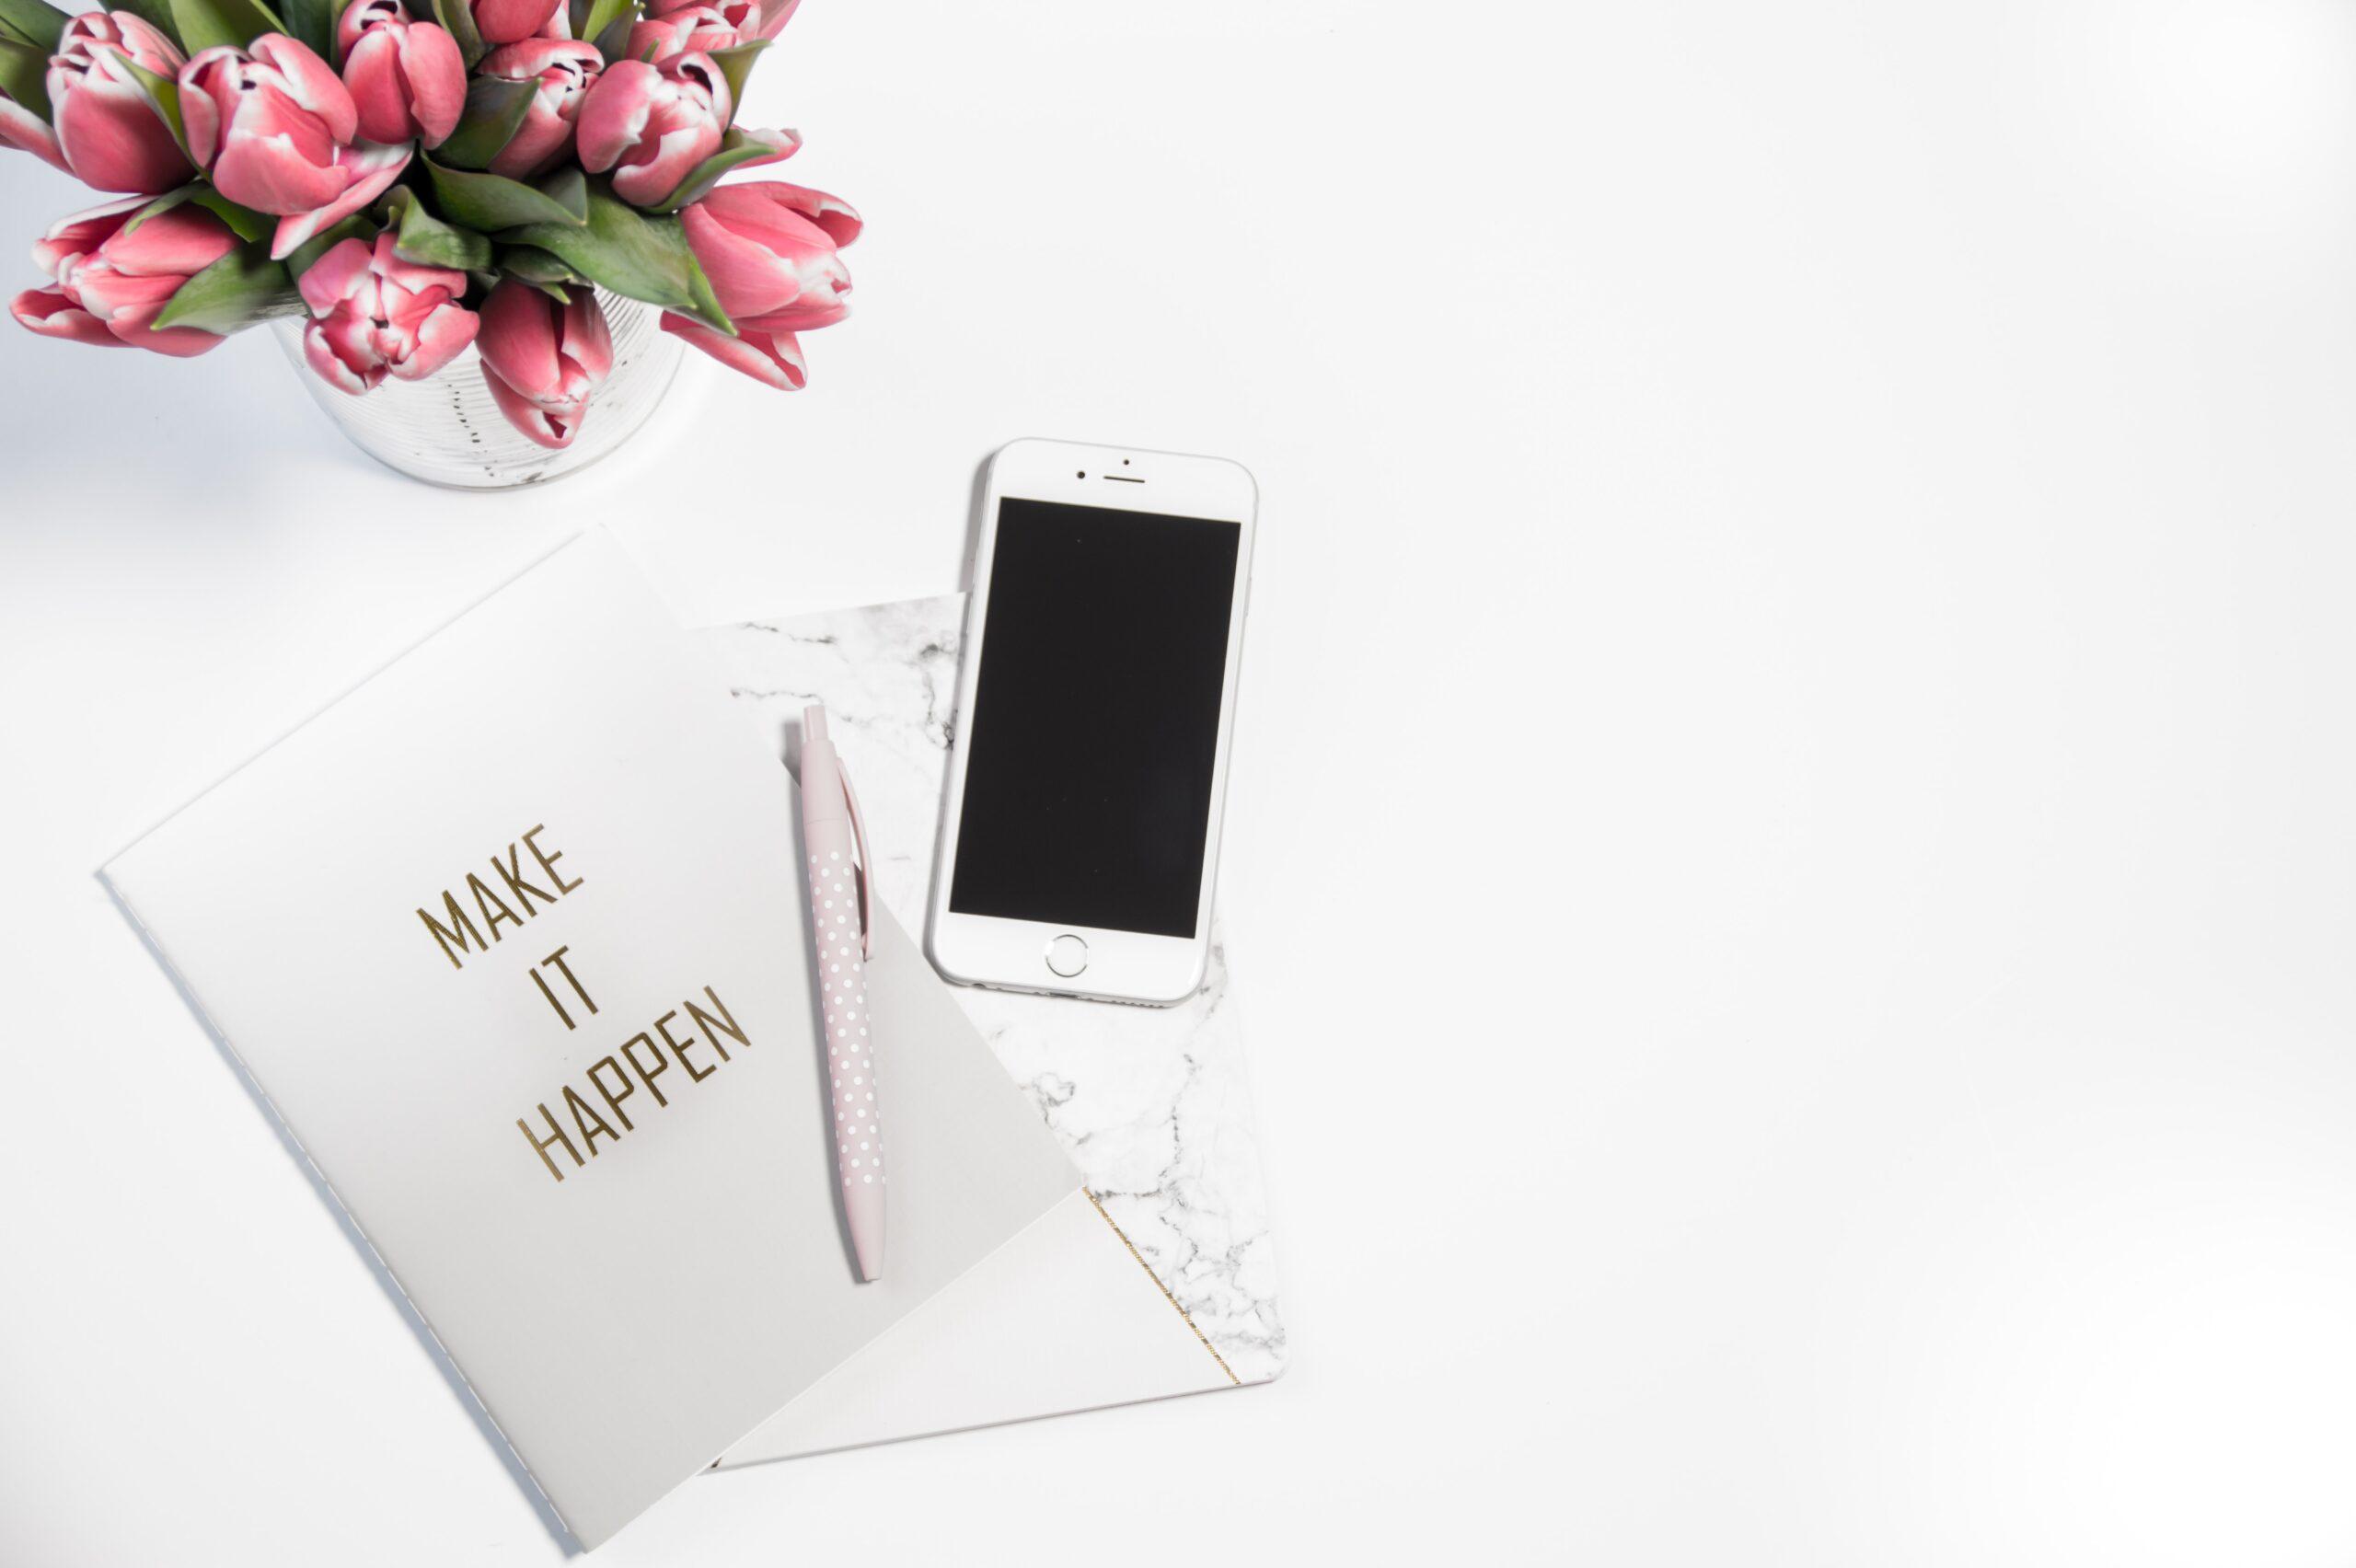 iphone-desk-planner-ChicDivaGeek